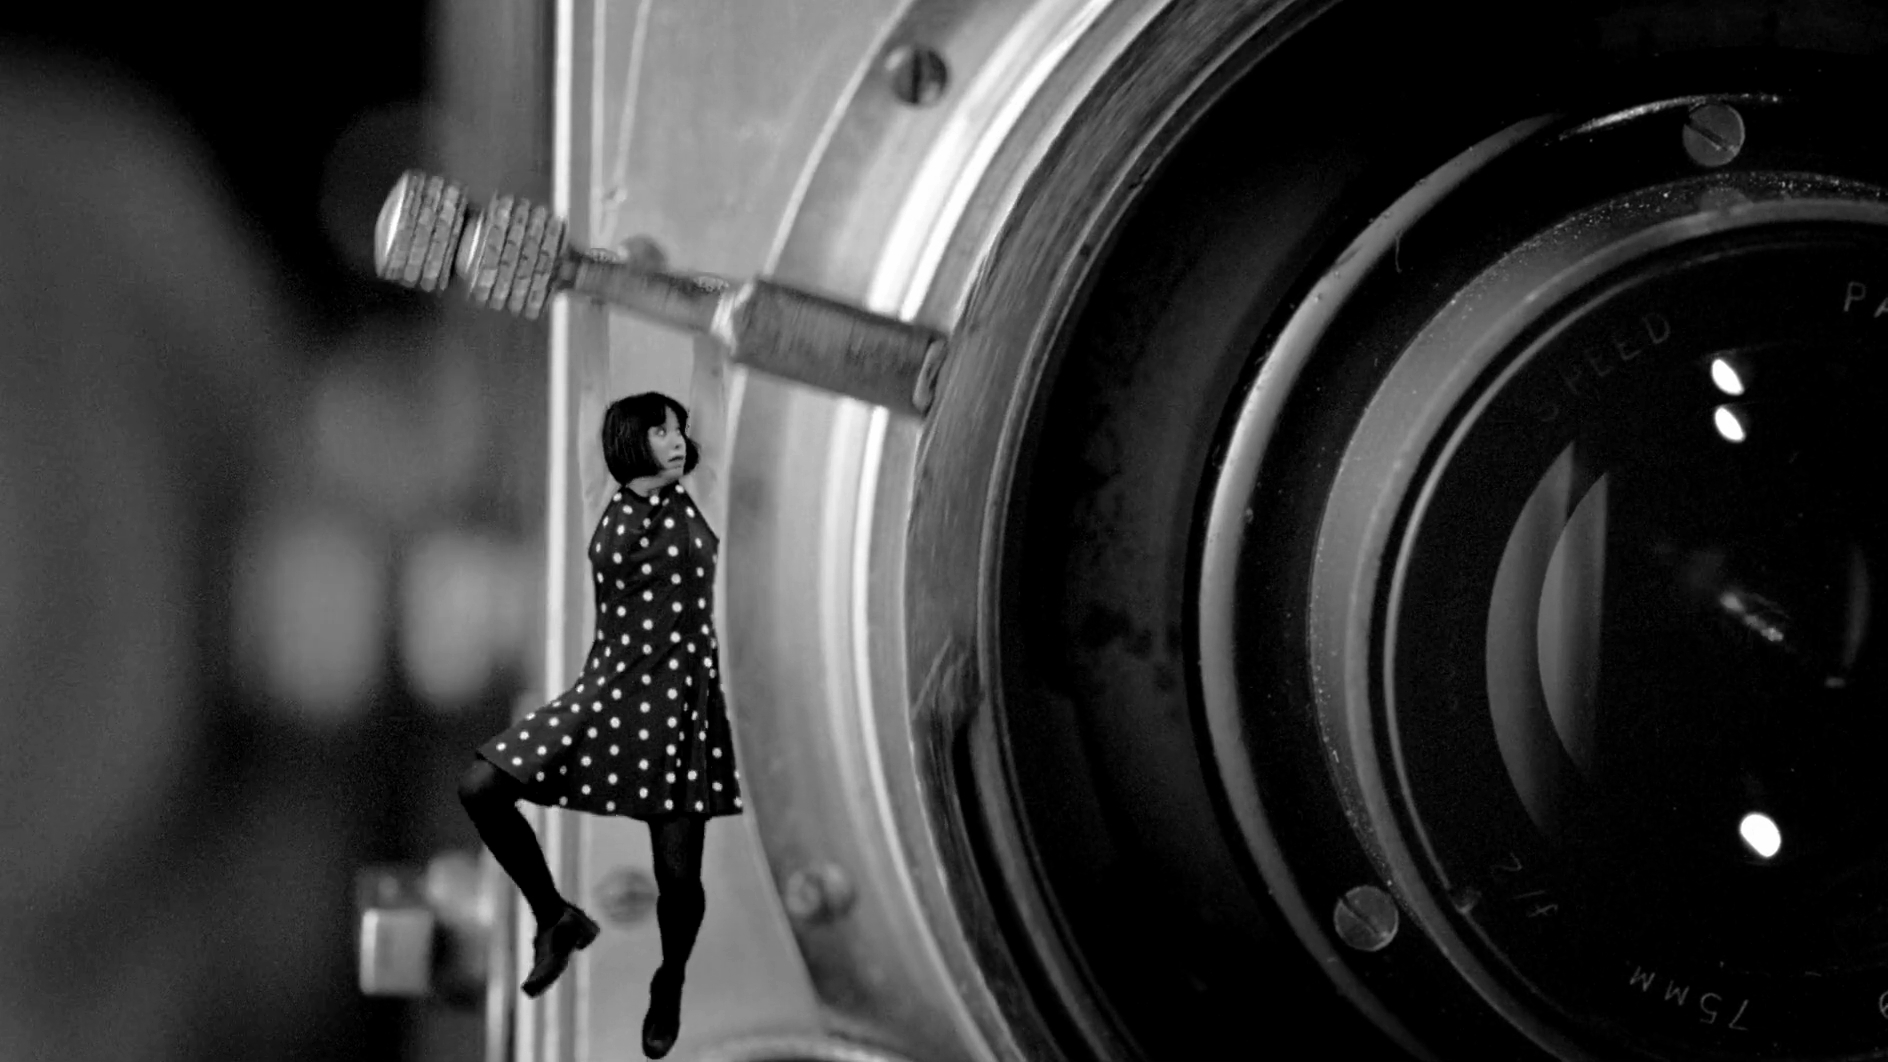 Dancin' the camera